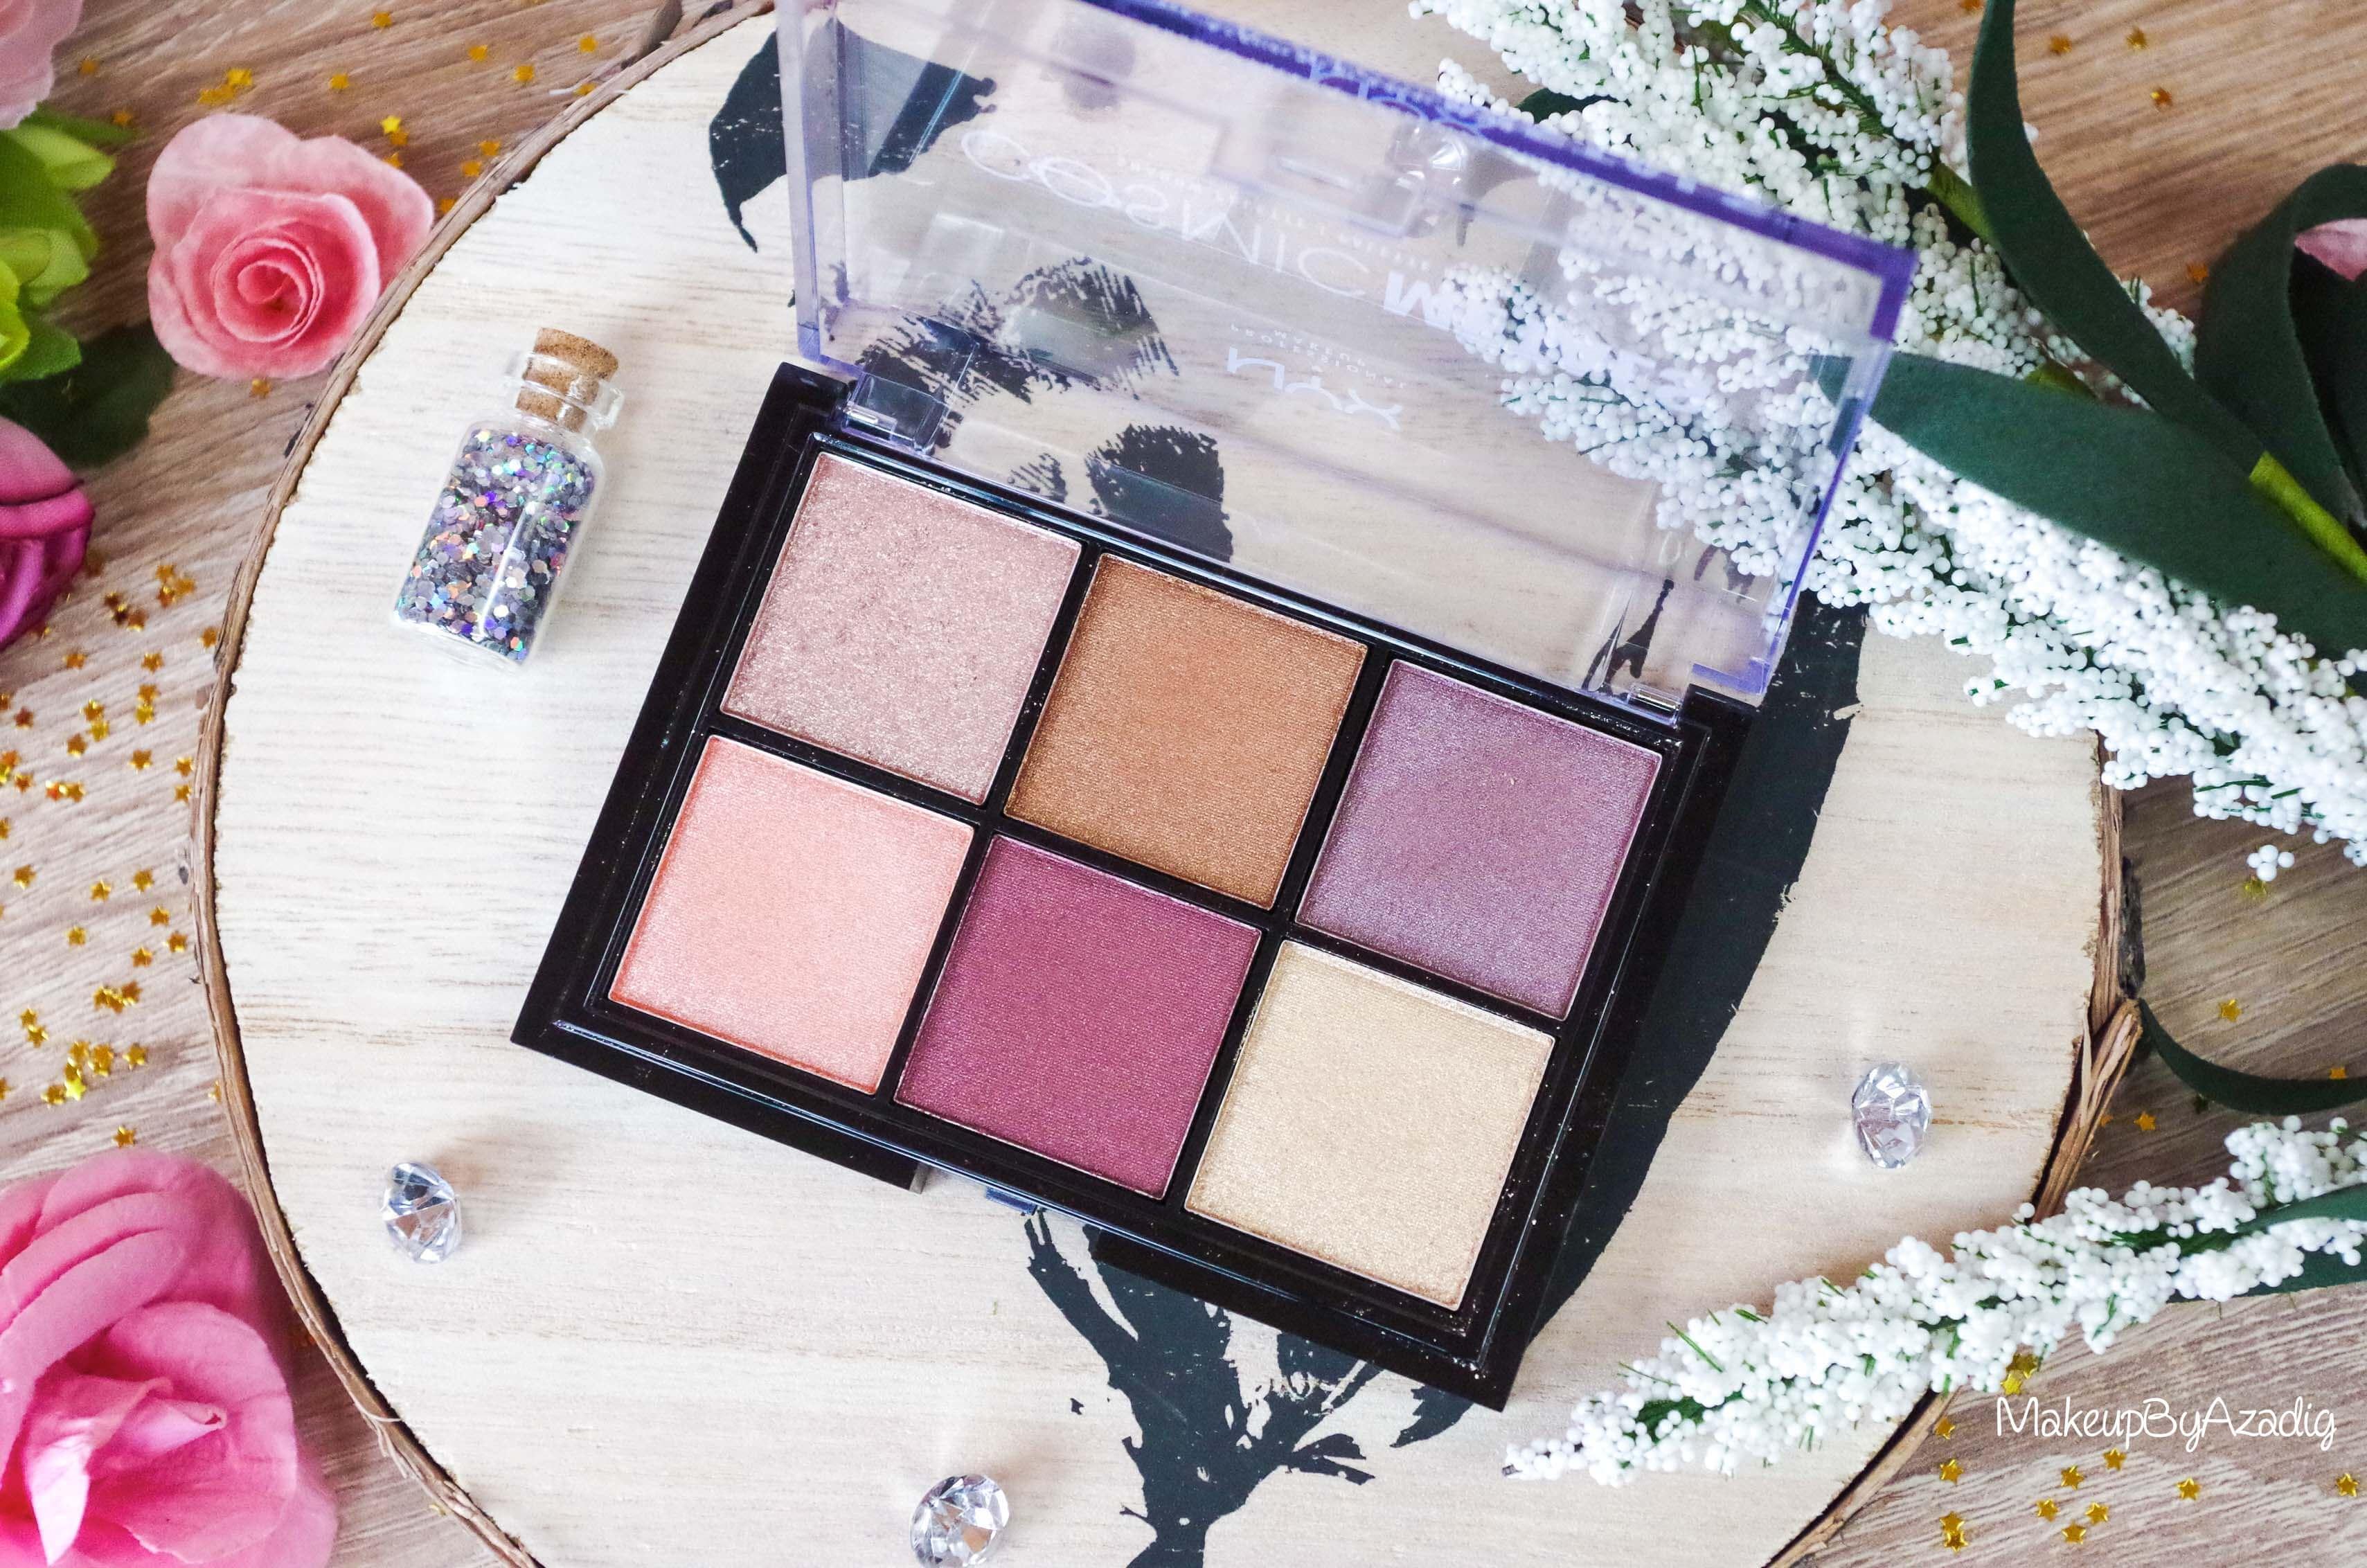 revue-palette-fards-paupieres-cosmic-metals-nyx-cosmetics-pas-cher-meilleure-makeupbyazadig-influencer-miniature